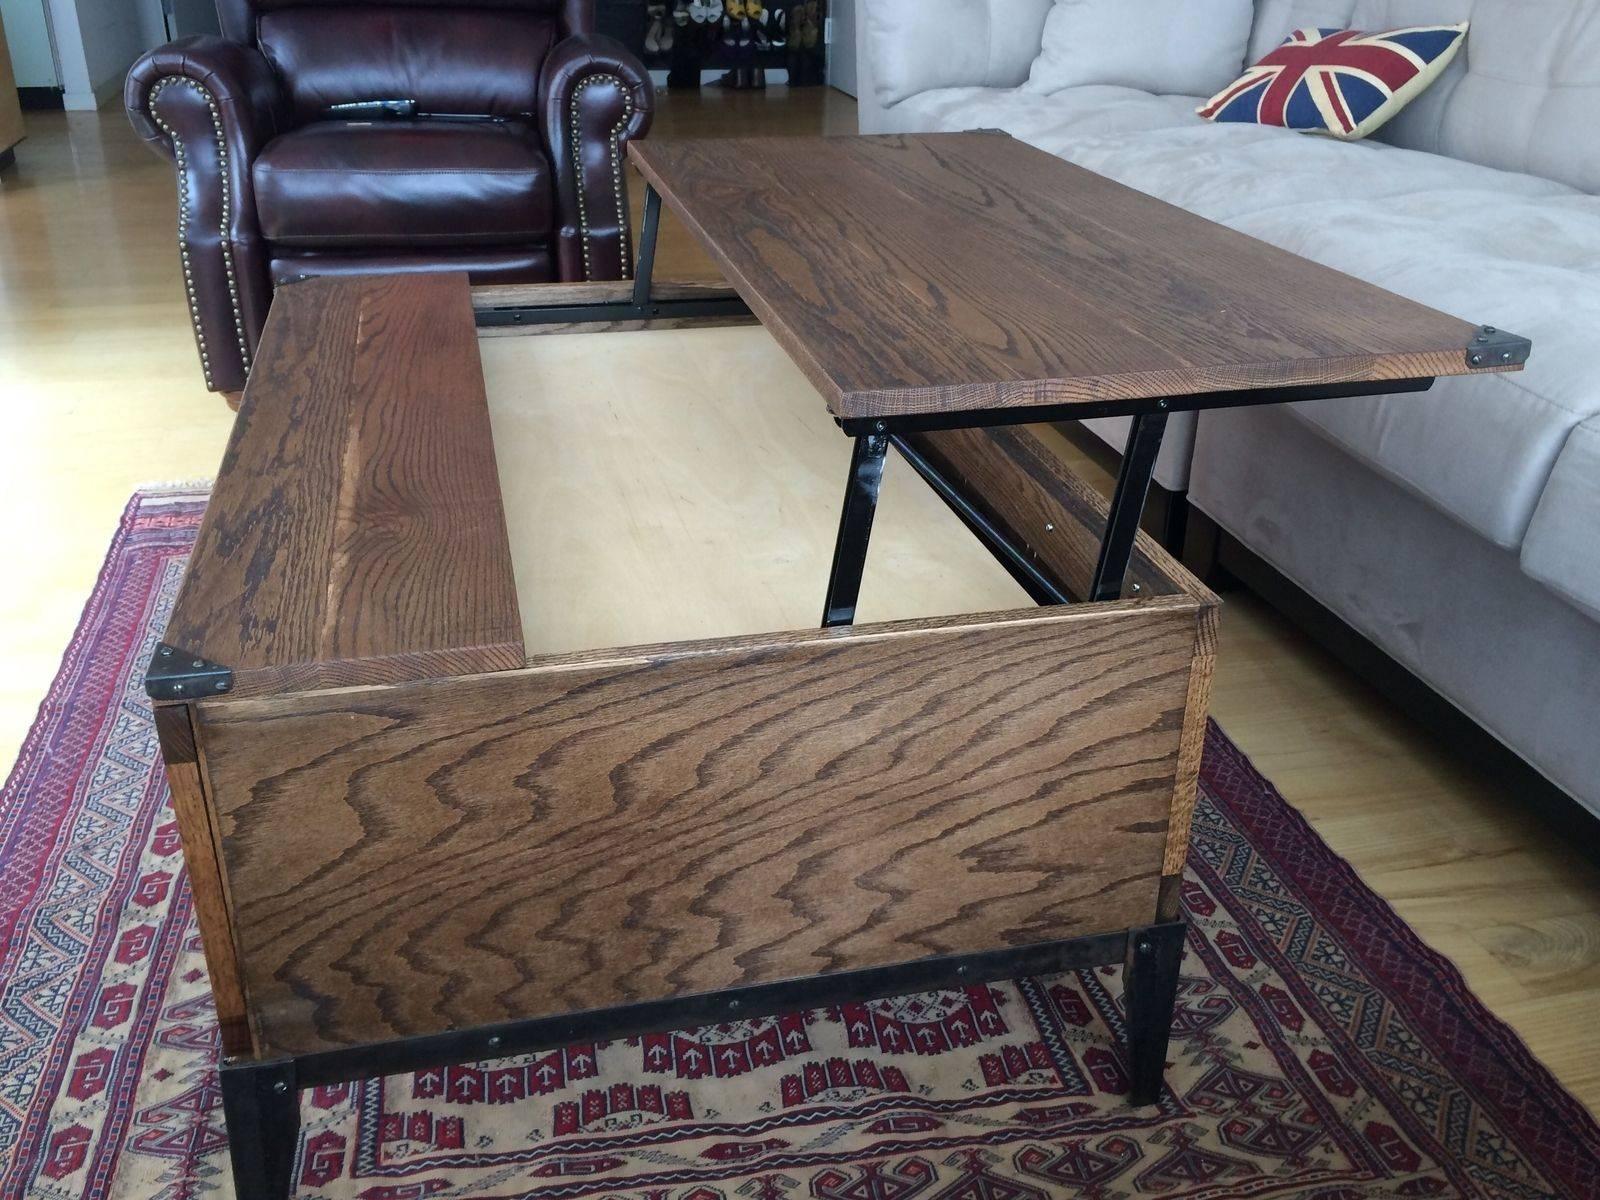 Custom Coffee Tables | Handmade Wood Coffee Tables | Custommade With Coffee Tables Extendable Top (View 8 of 30)